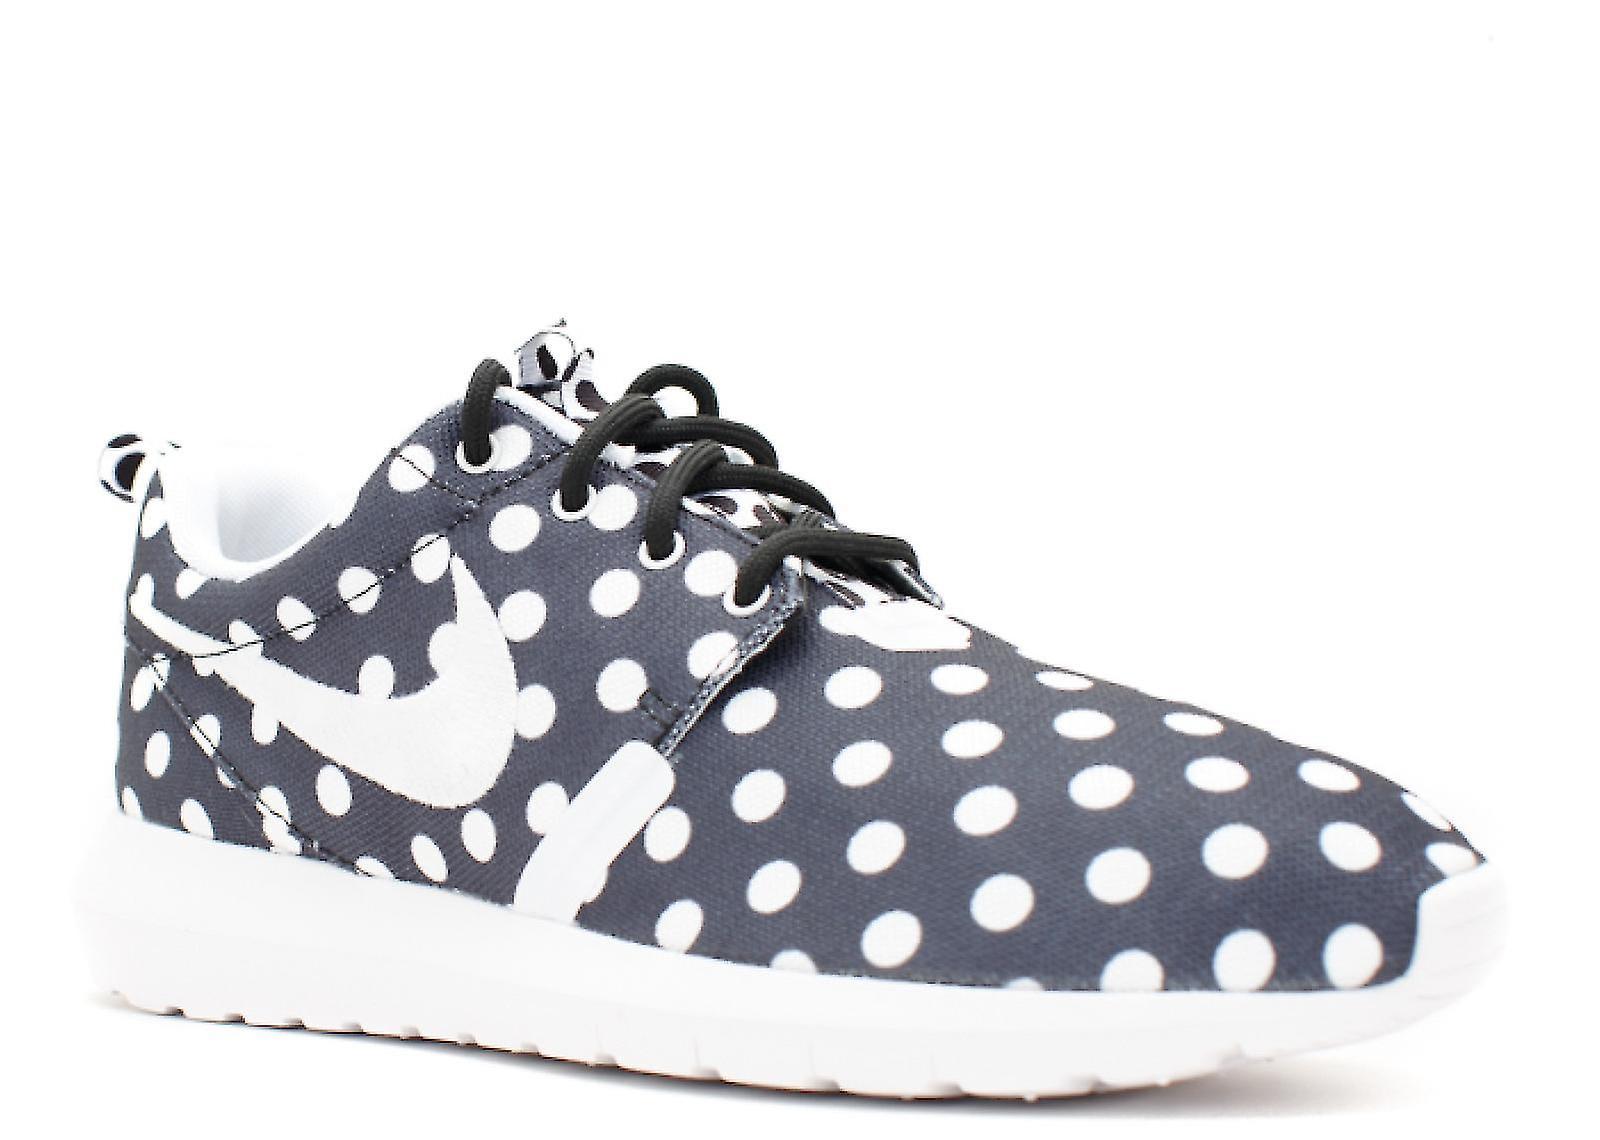 Roshe Nm Qs ??Polka Dot Pack?? Pack?? Pack?? - 810857-001 - chaussures | Terrific Value  | Outlet Store Online  817fde